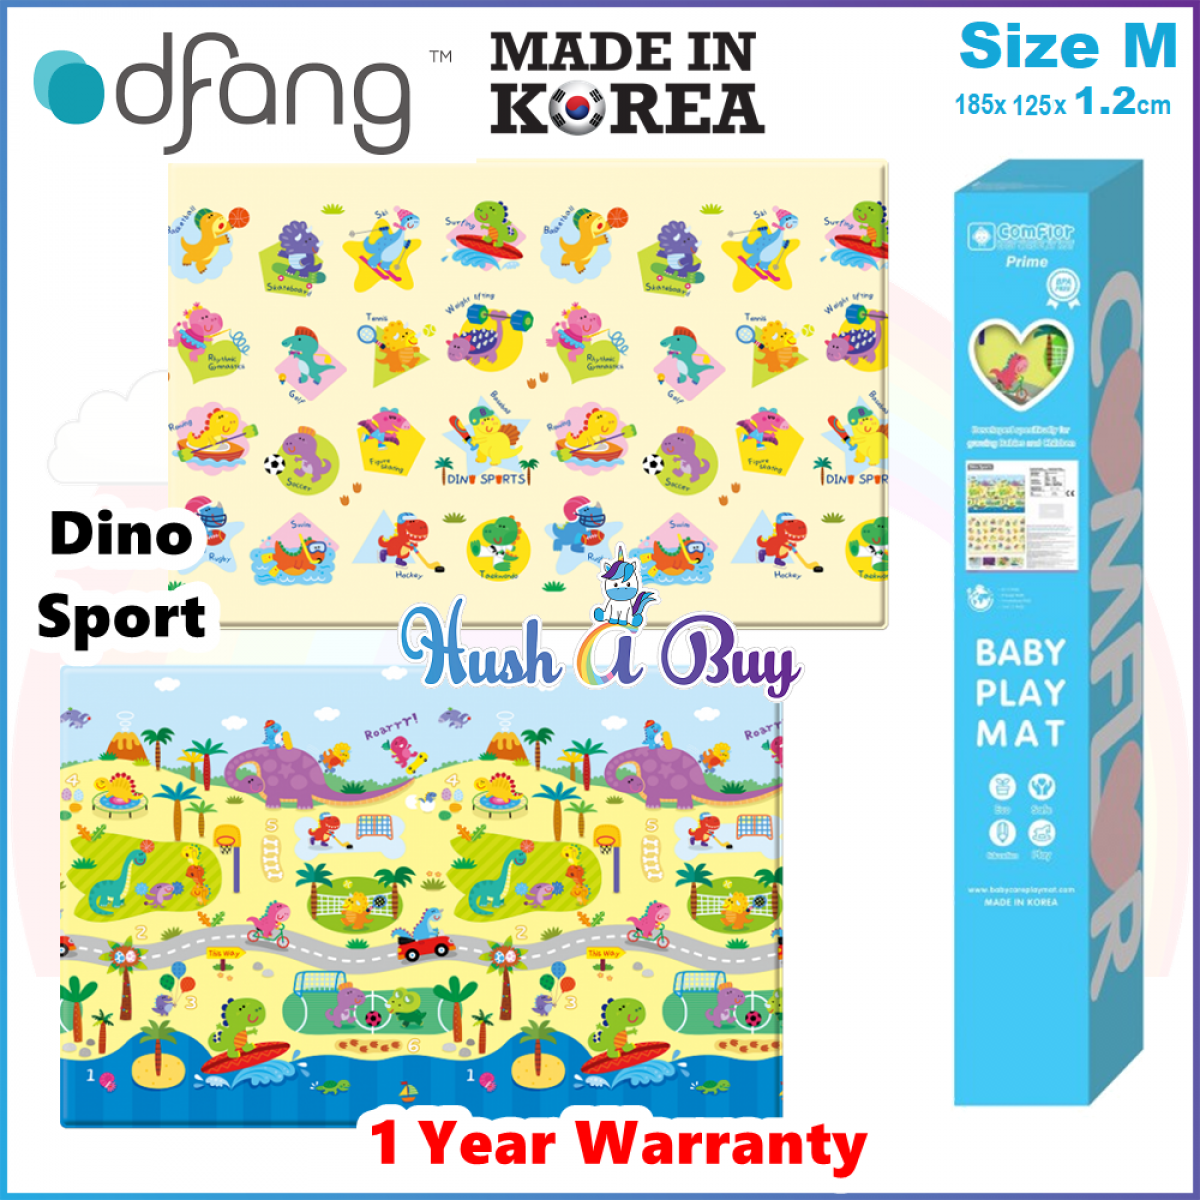 Comflor Prime BabyCare Premium PVC Mat (185cmx125cmx1.2cm ) Size M - Made in Korea - 1 Year Warranty